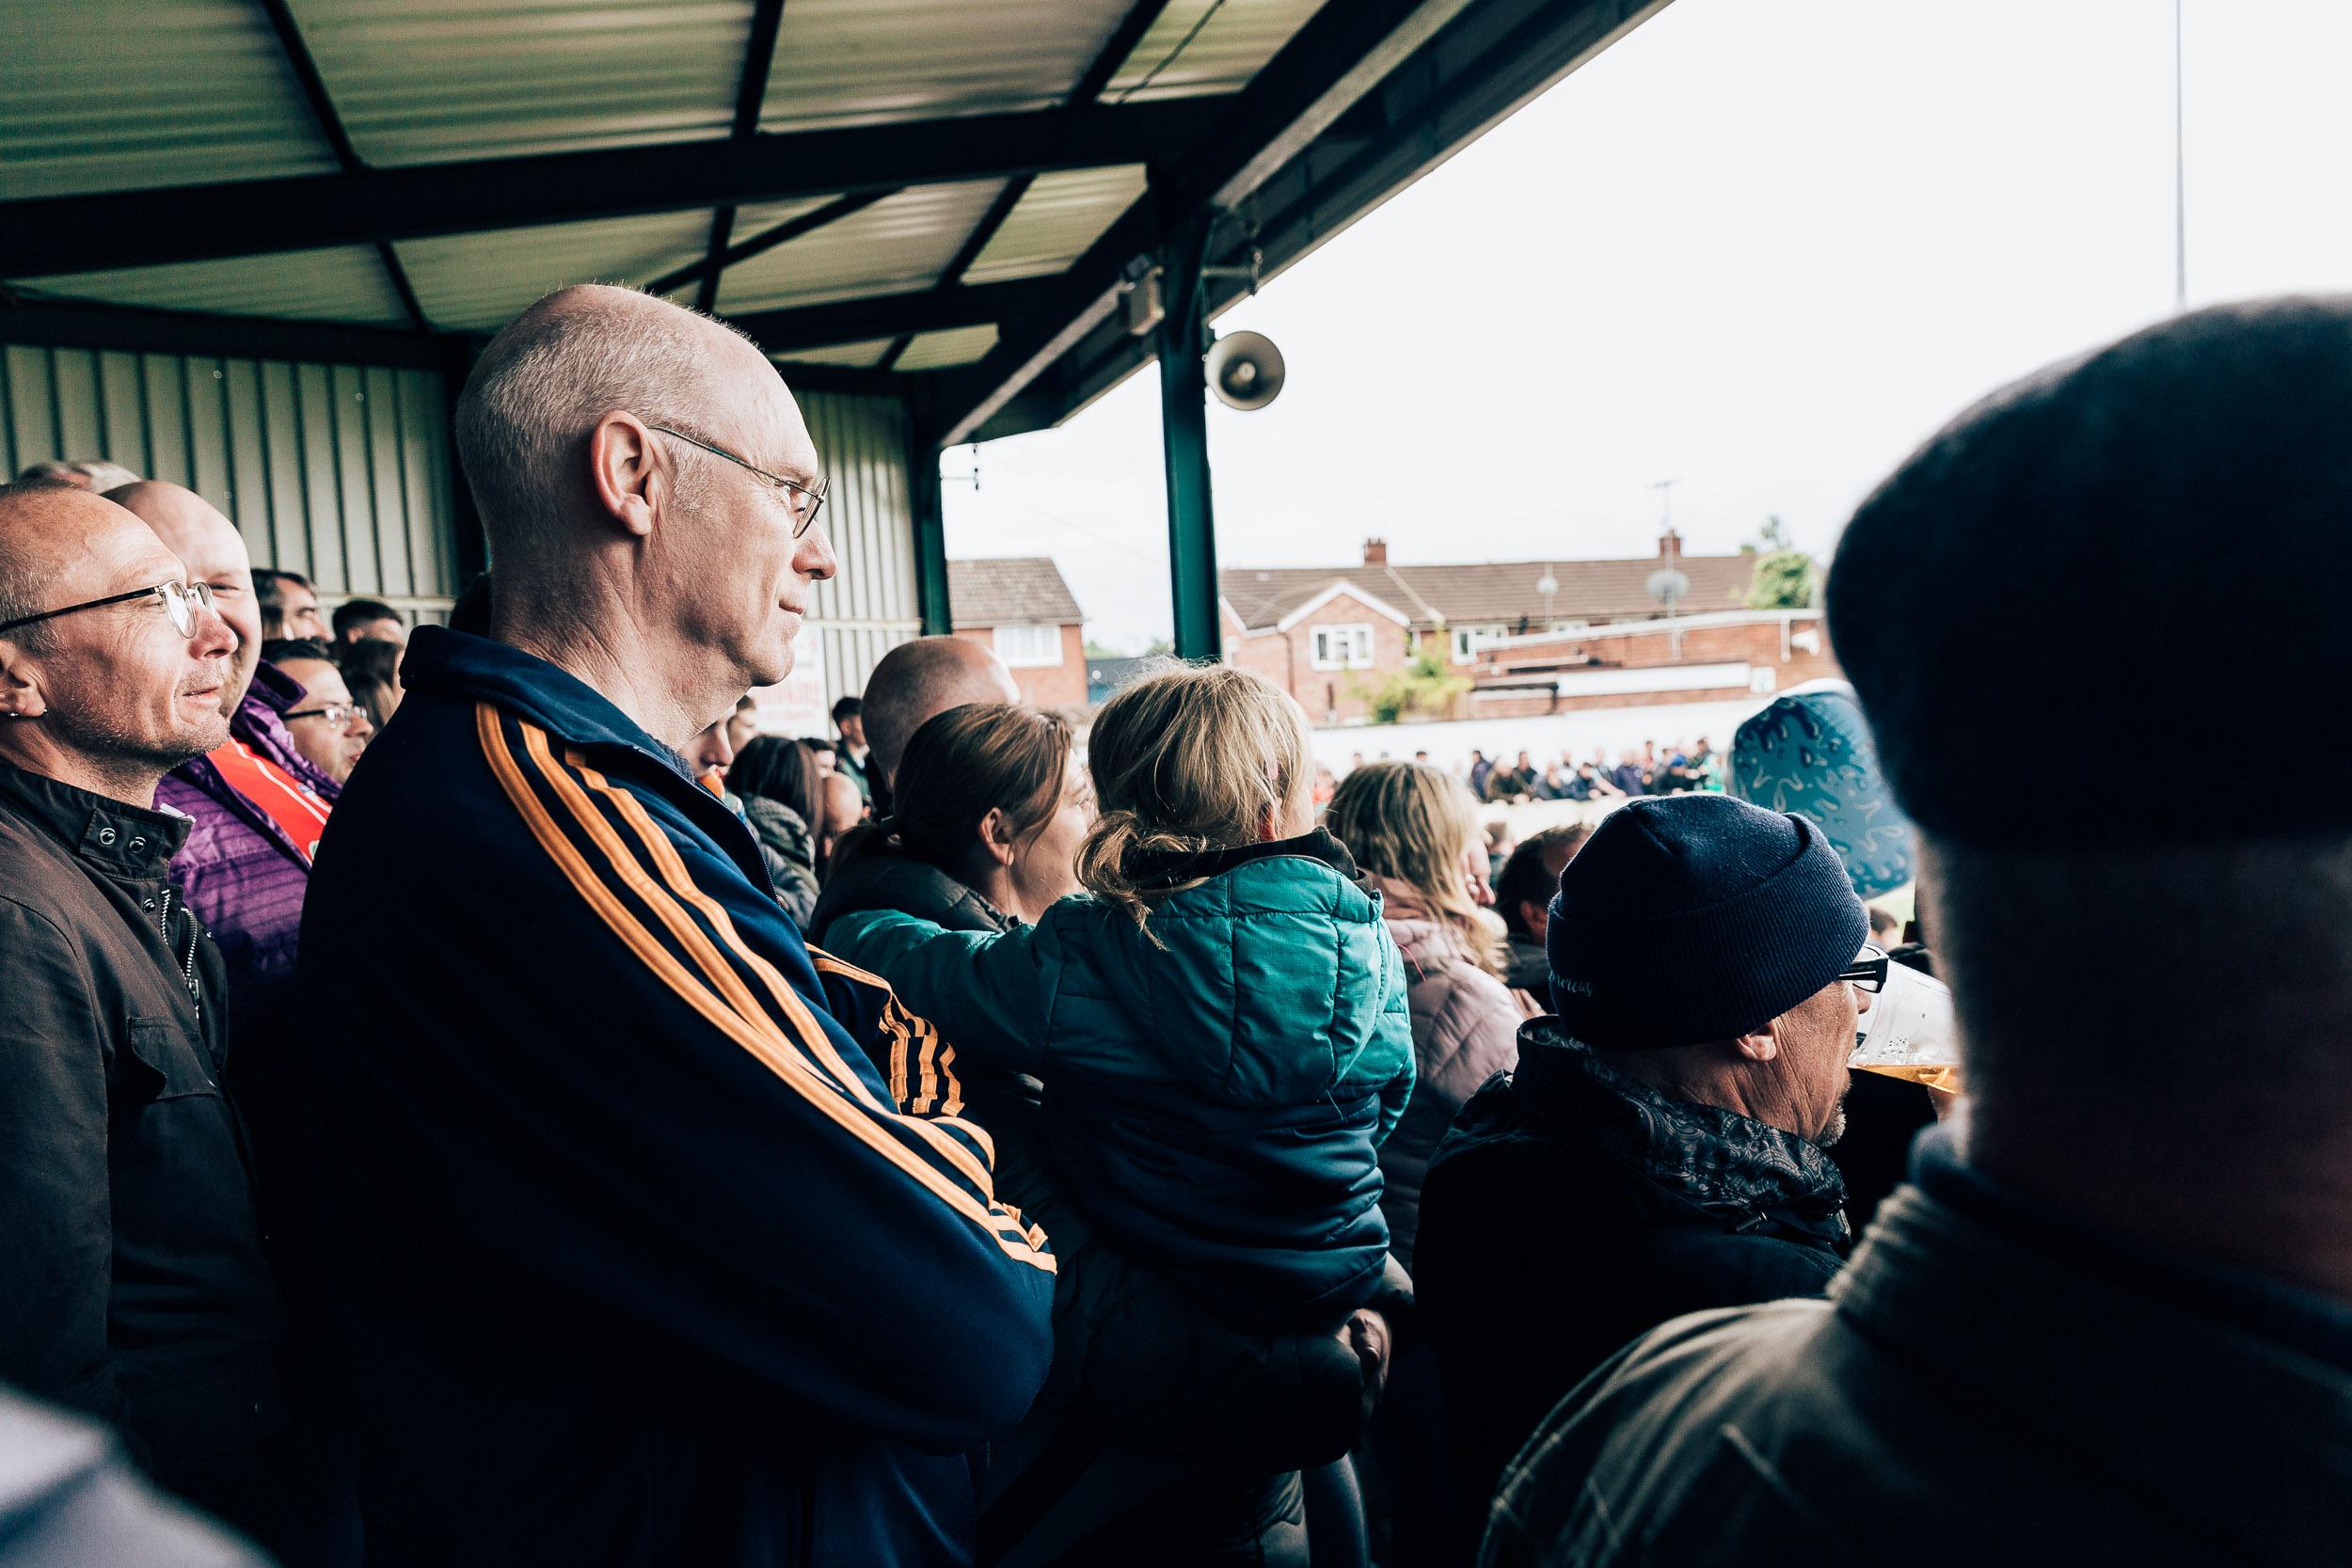 06_05_2019_Bromsgrove_Sporting_Corby-50.jpg